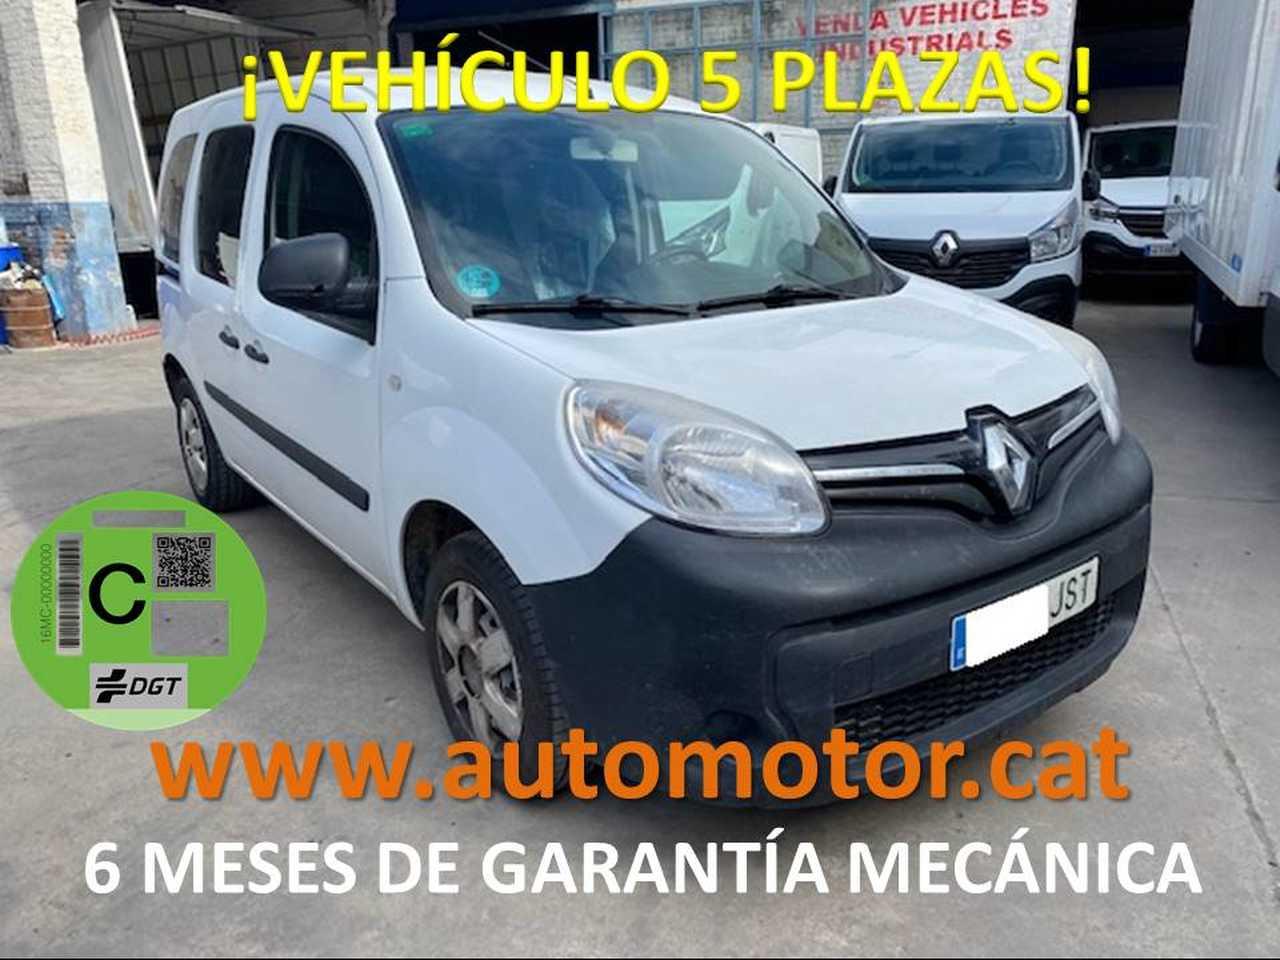 Renault Kangoo combi 1.5dCi En. Profesional M1 66kW - GARANTIA MECANICA  - Foto 1